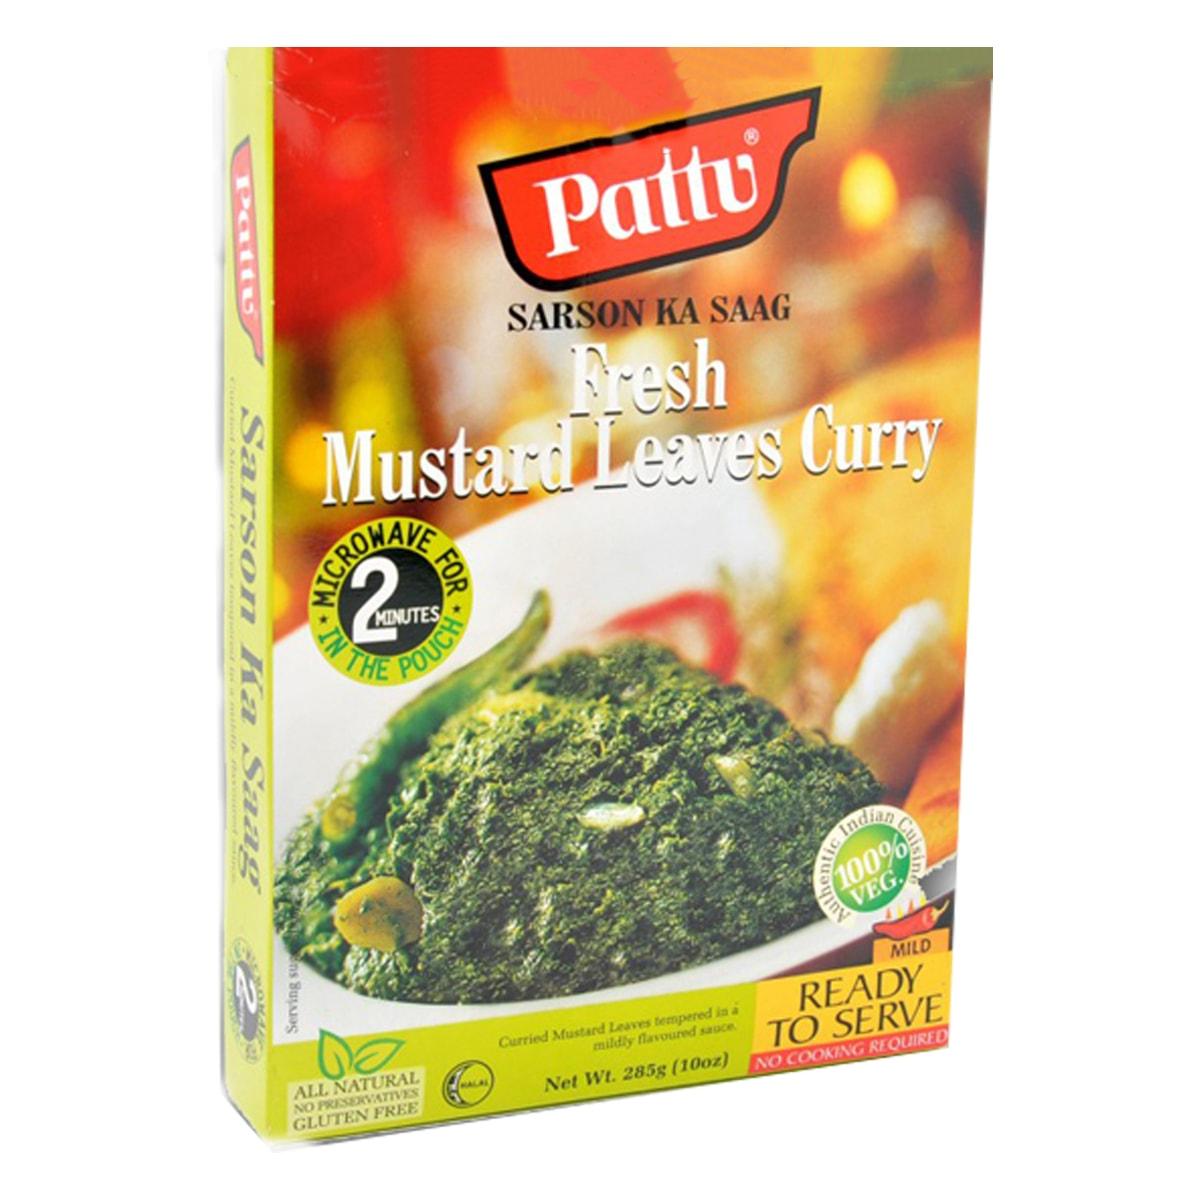 Buy Pattu Sarson Ka Saag (Fresh Mustard Leaves Curry) Ready to Serve - 285 gm